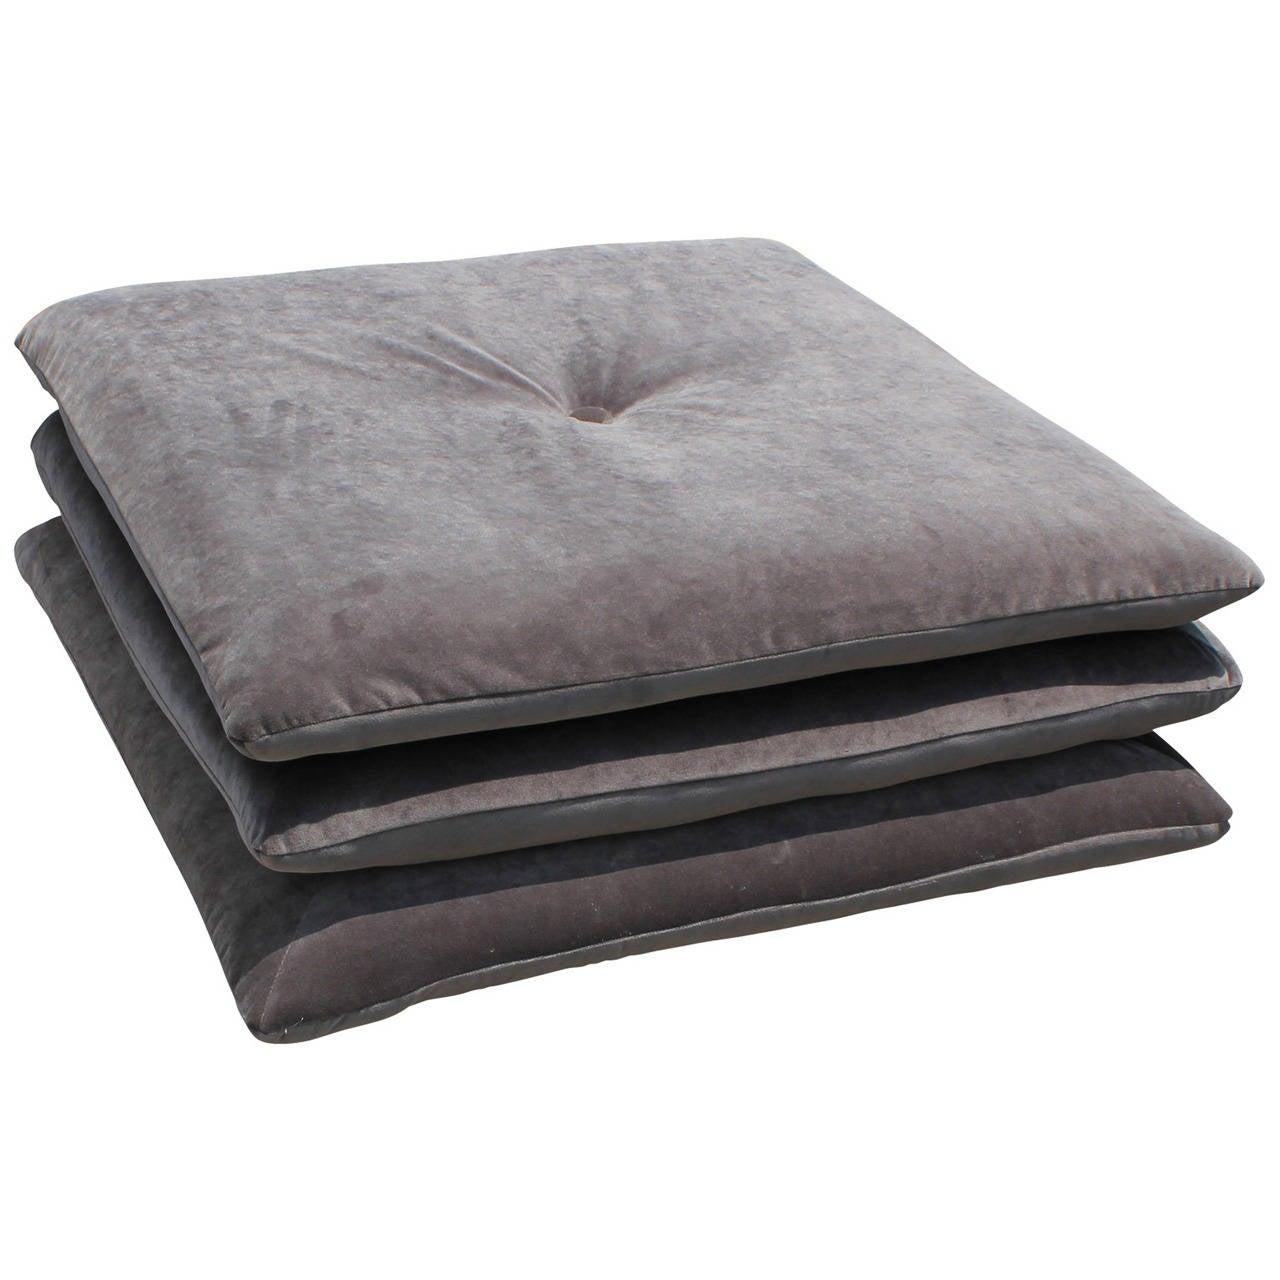 Plush Large Grey Velvet Ottoman Or Pouf At 1stdibs